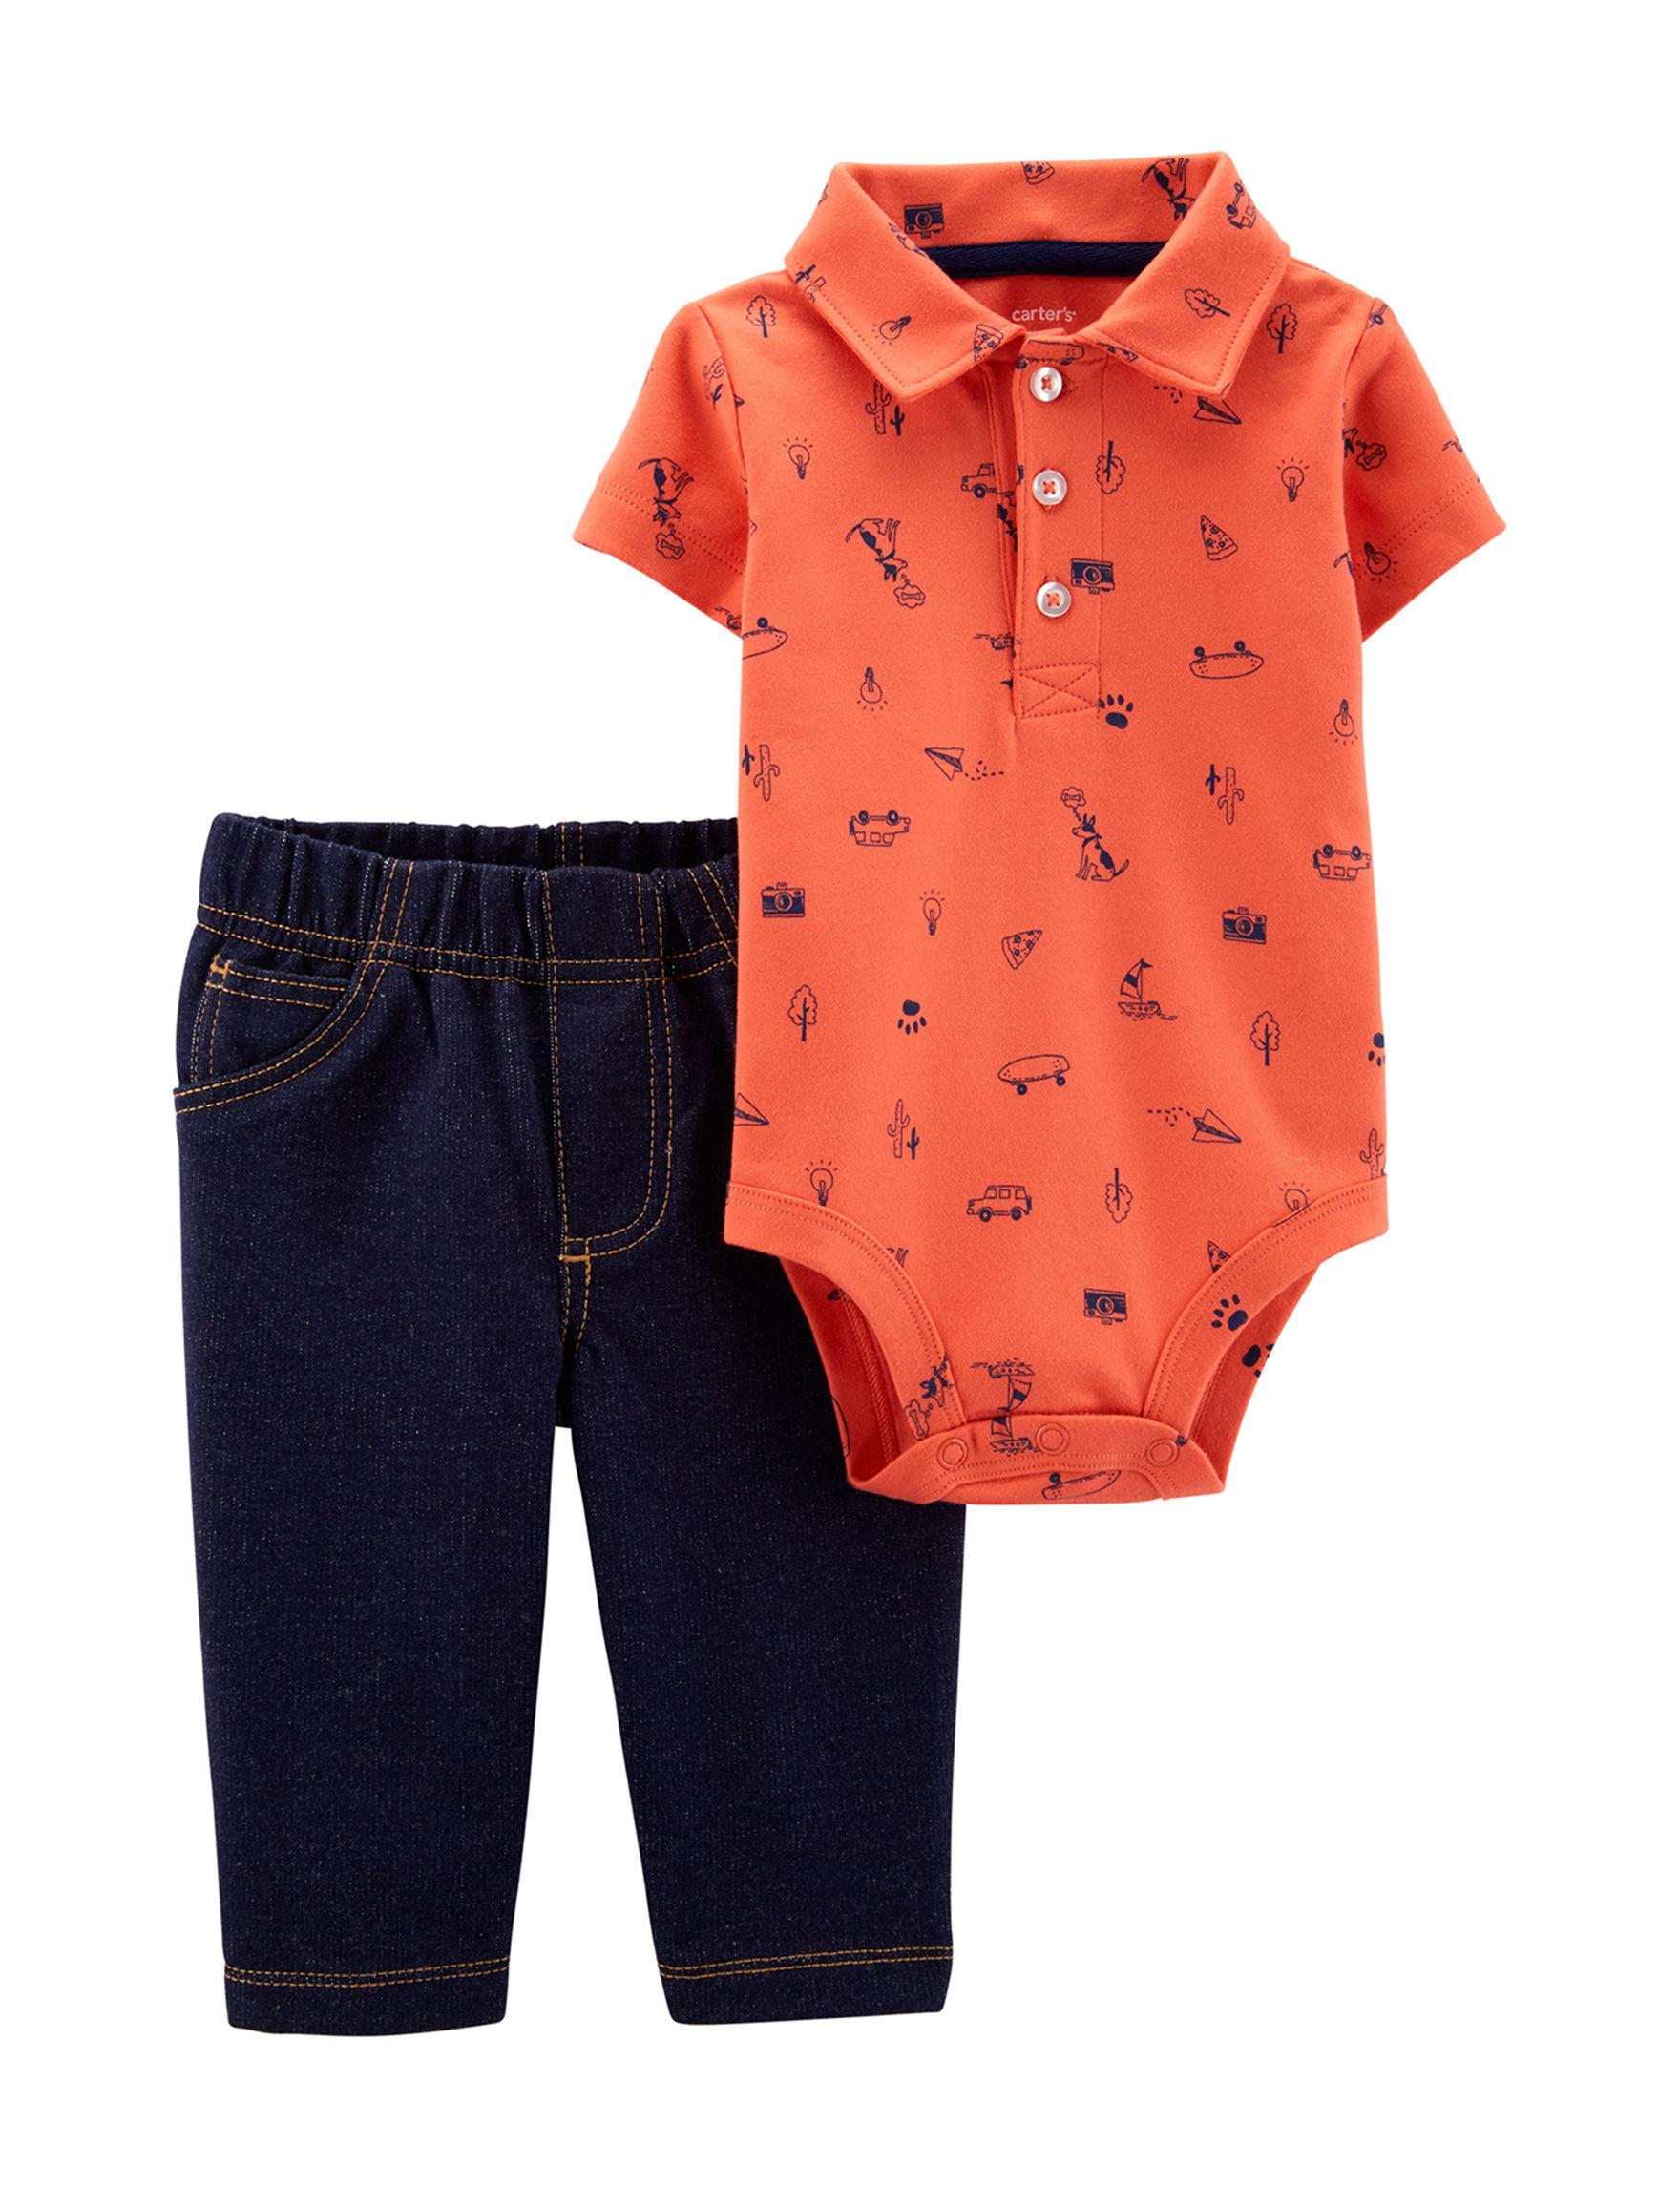 Carter's Orange / Navy